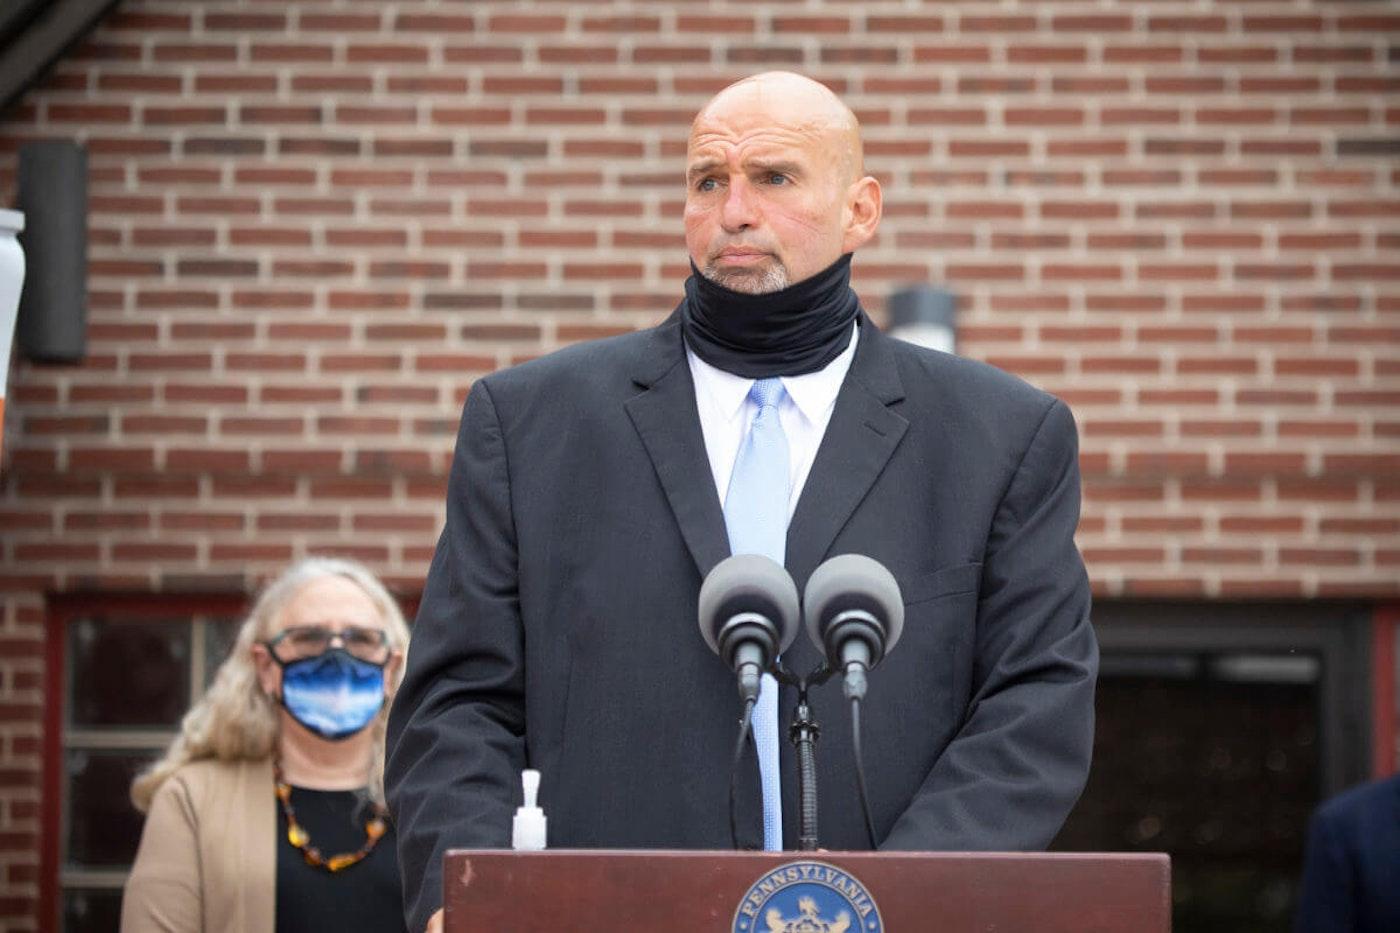 Lt. Gov. John Fetterman has been a proponent of unions and legalizing marijuana.